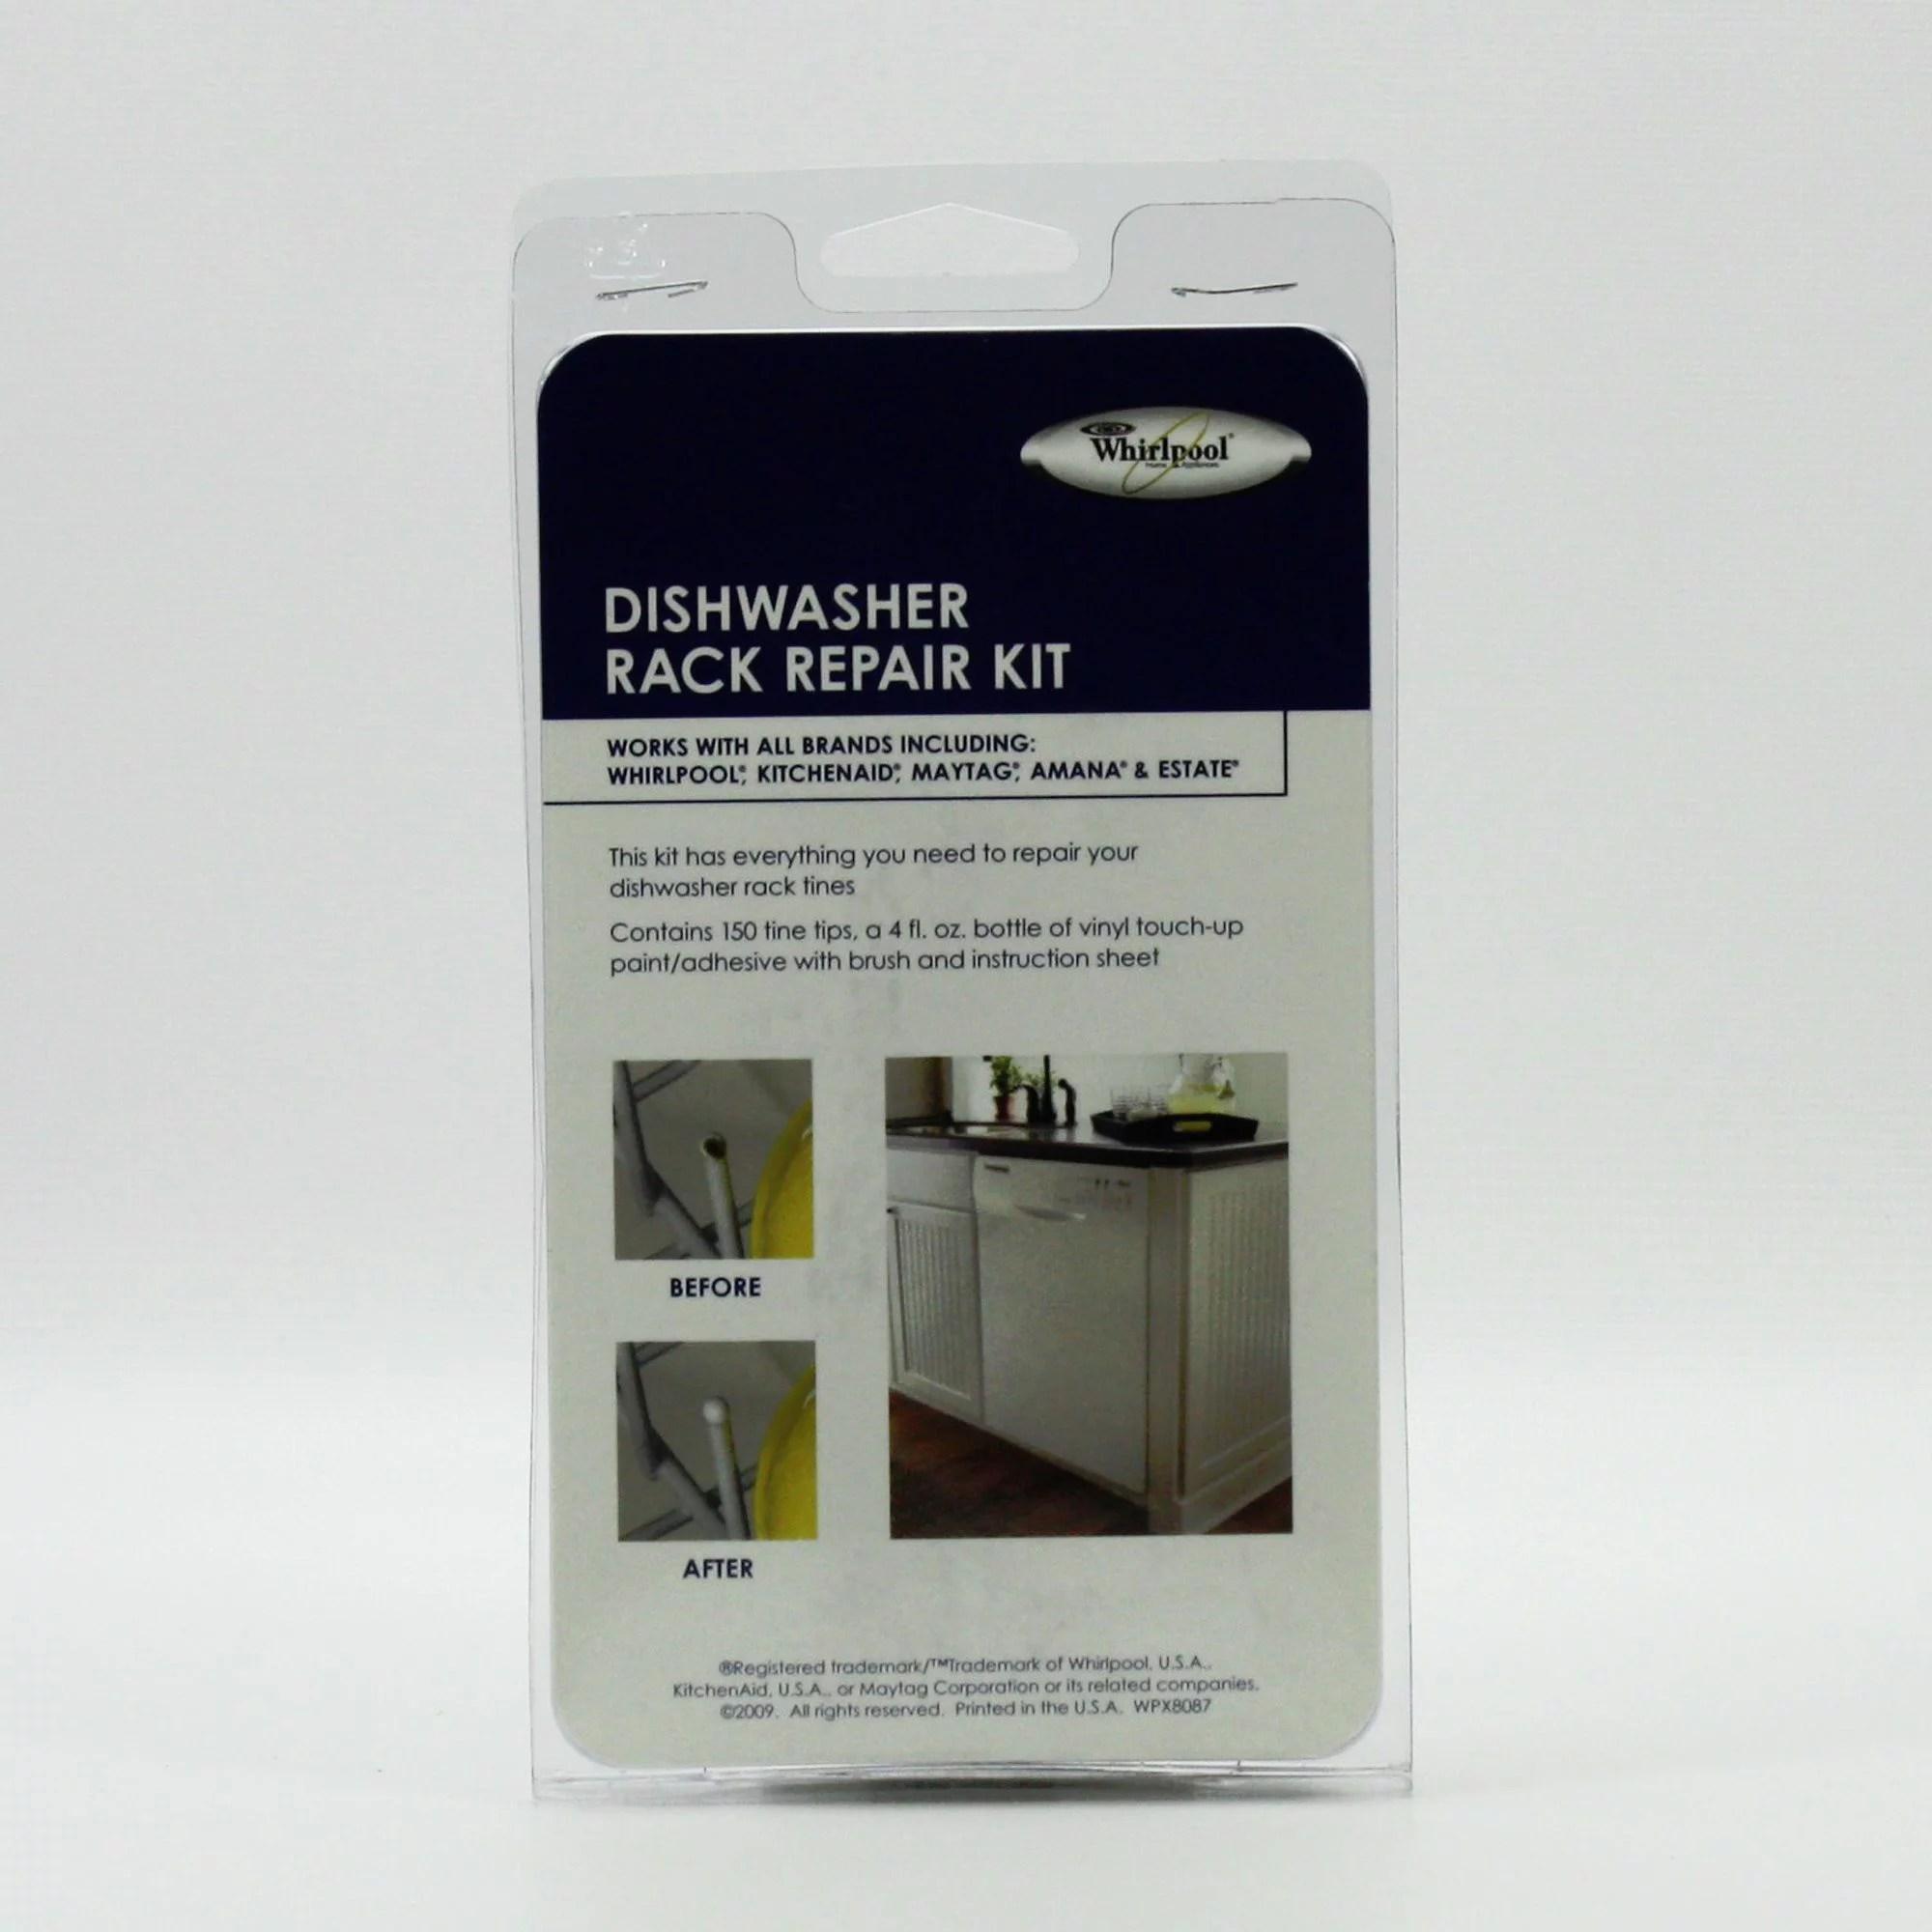 4396838rc for whirlpool dishwasher tine tip rack repair kit walmart com